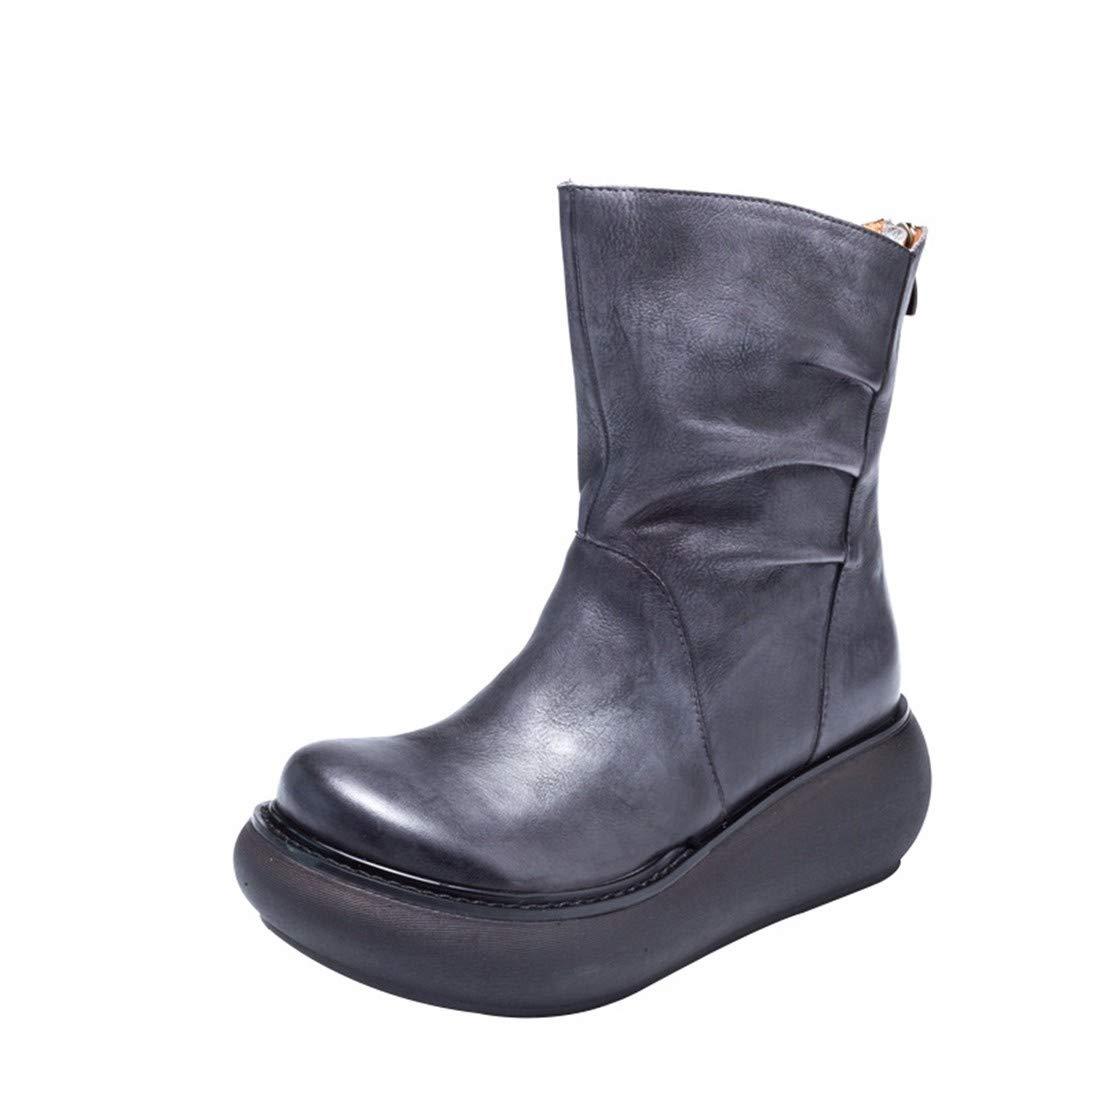 BeatinToes Damen Herbst Winter Warm Wasserdicht Anti Slip Leder Martin Stiefel Retro Pure Casual Hohe Kurze Stiefel Verfolgte